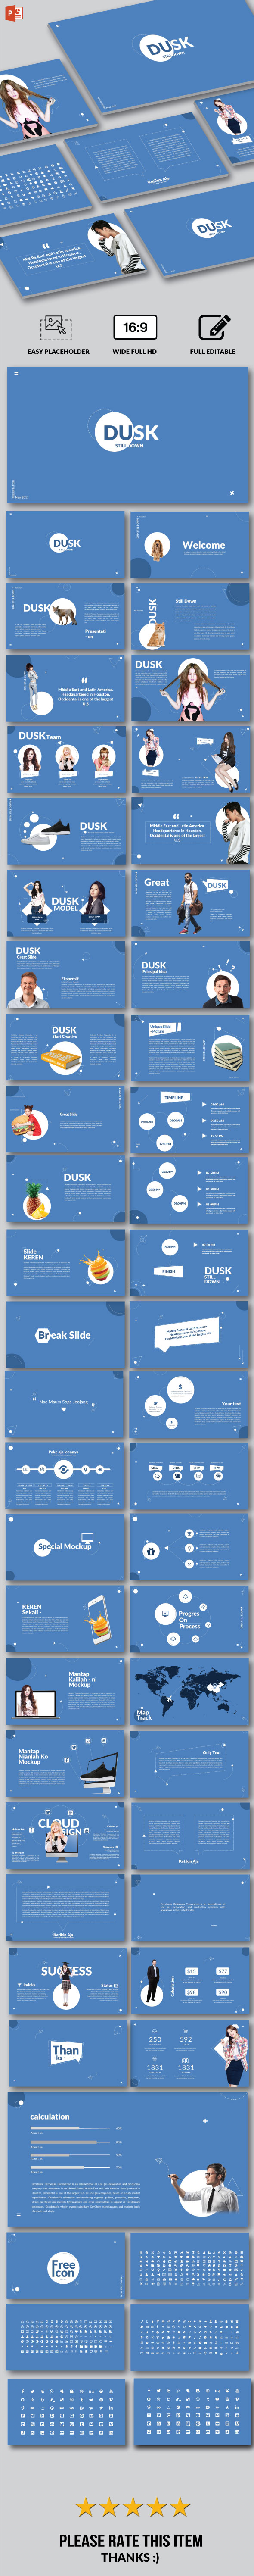 Dusk - Multipurpose Powerpoint - PowerPoint Templates Presentation Templates